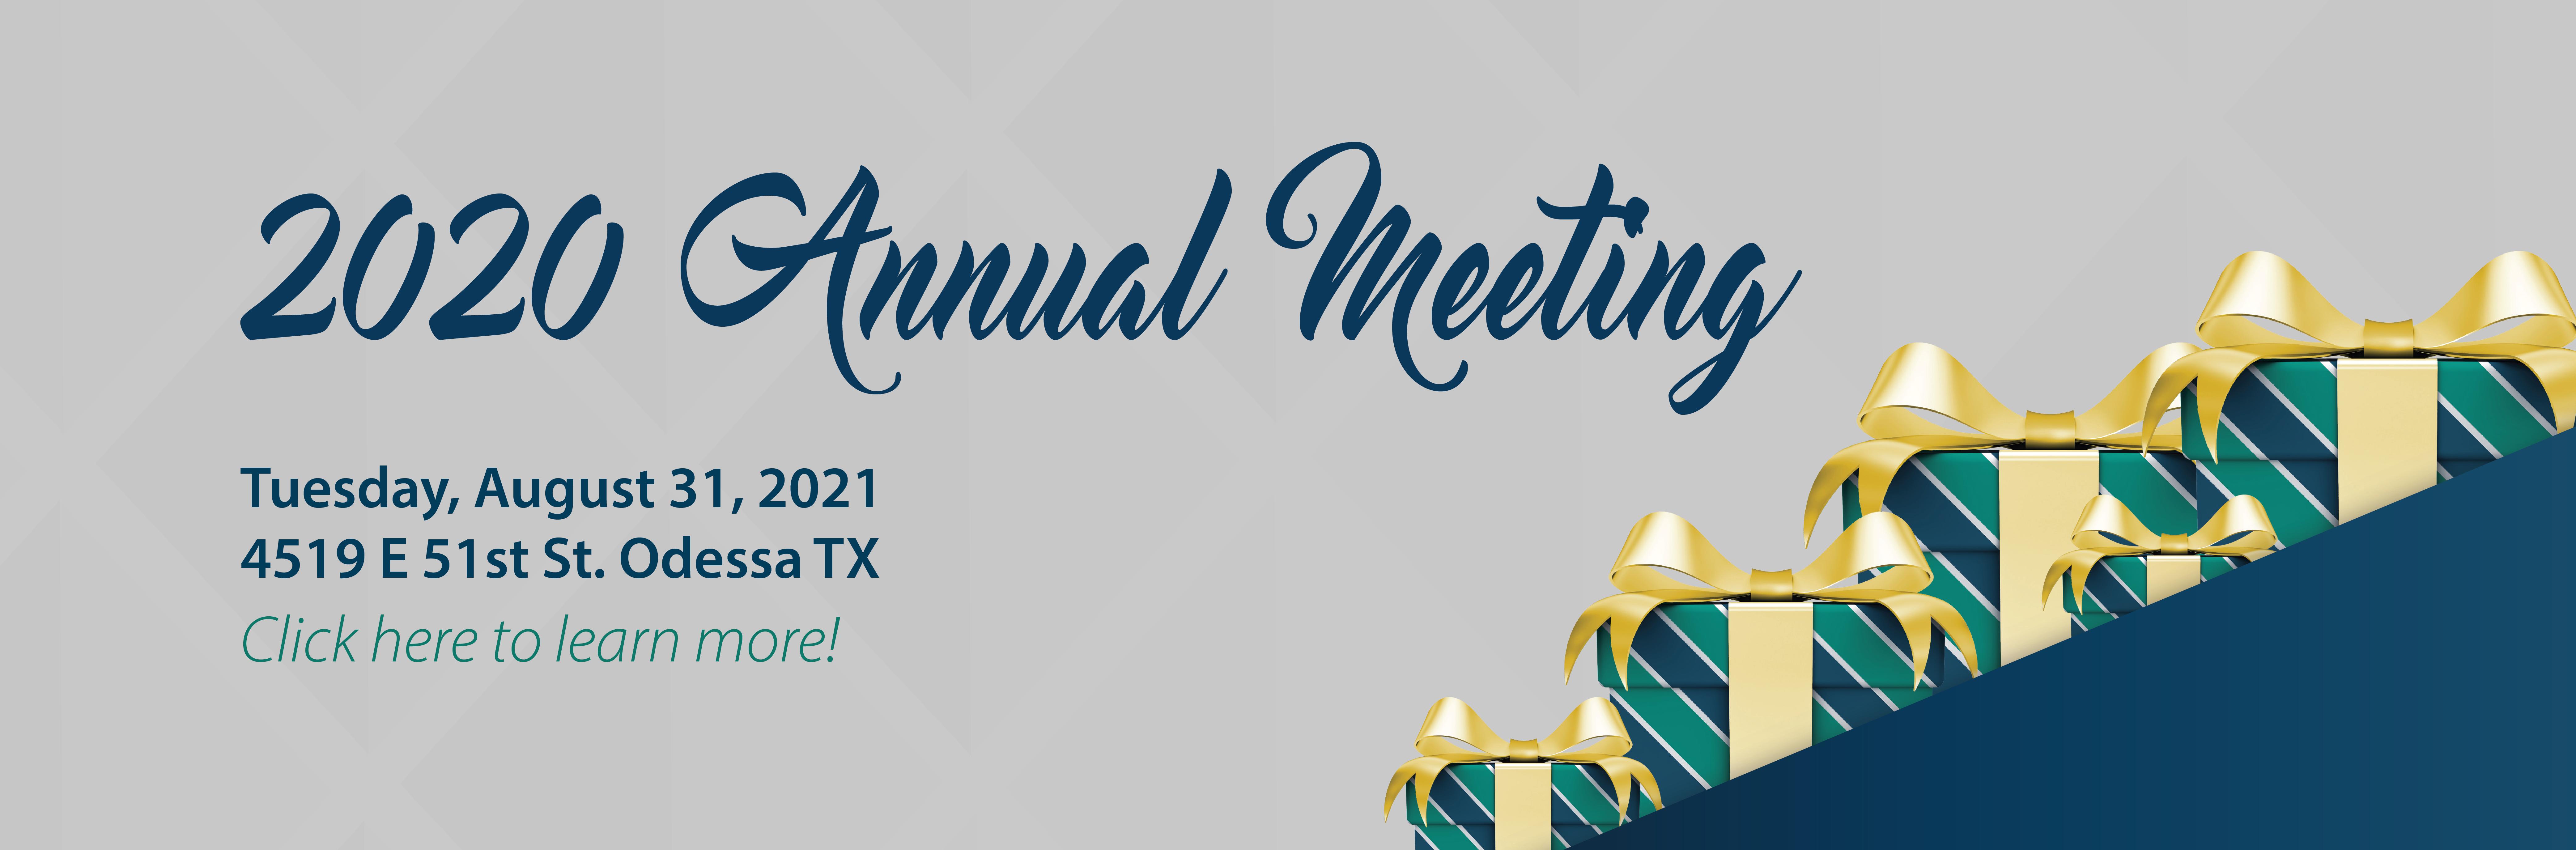 Annual Meeting Notice